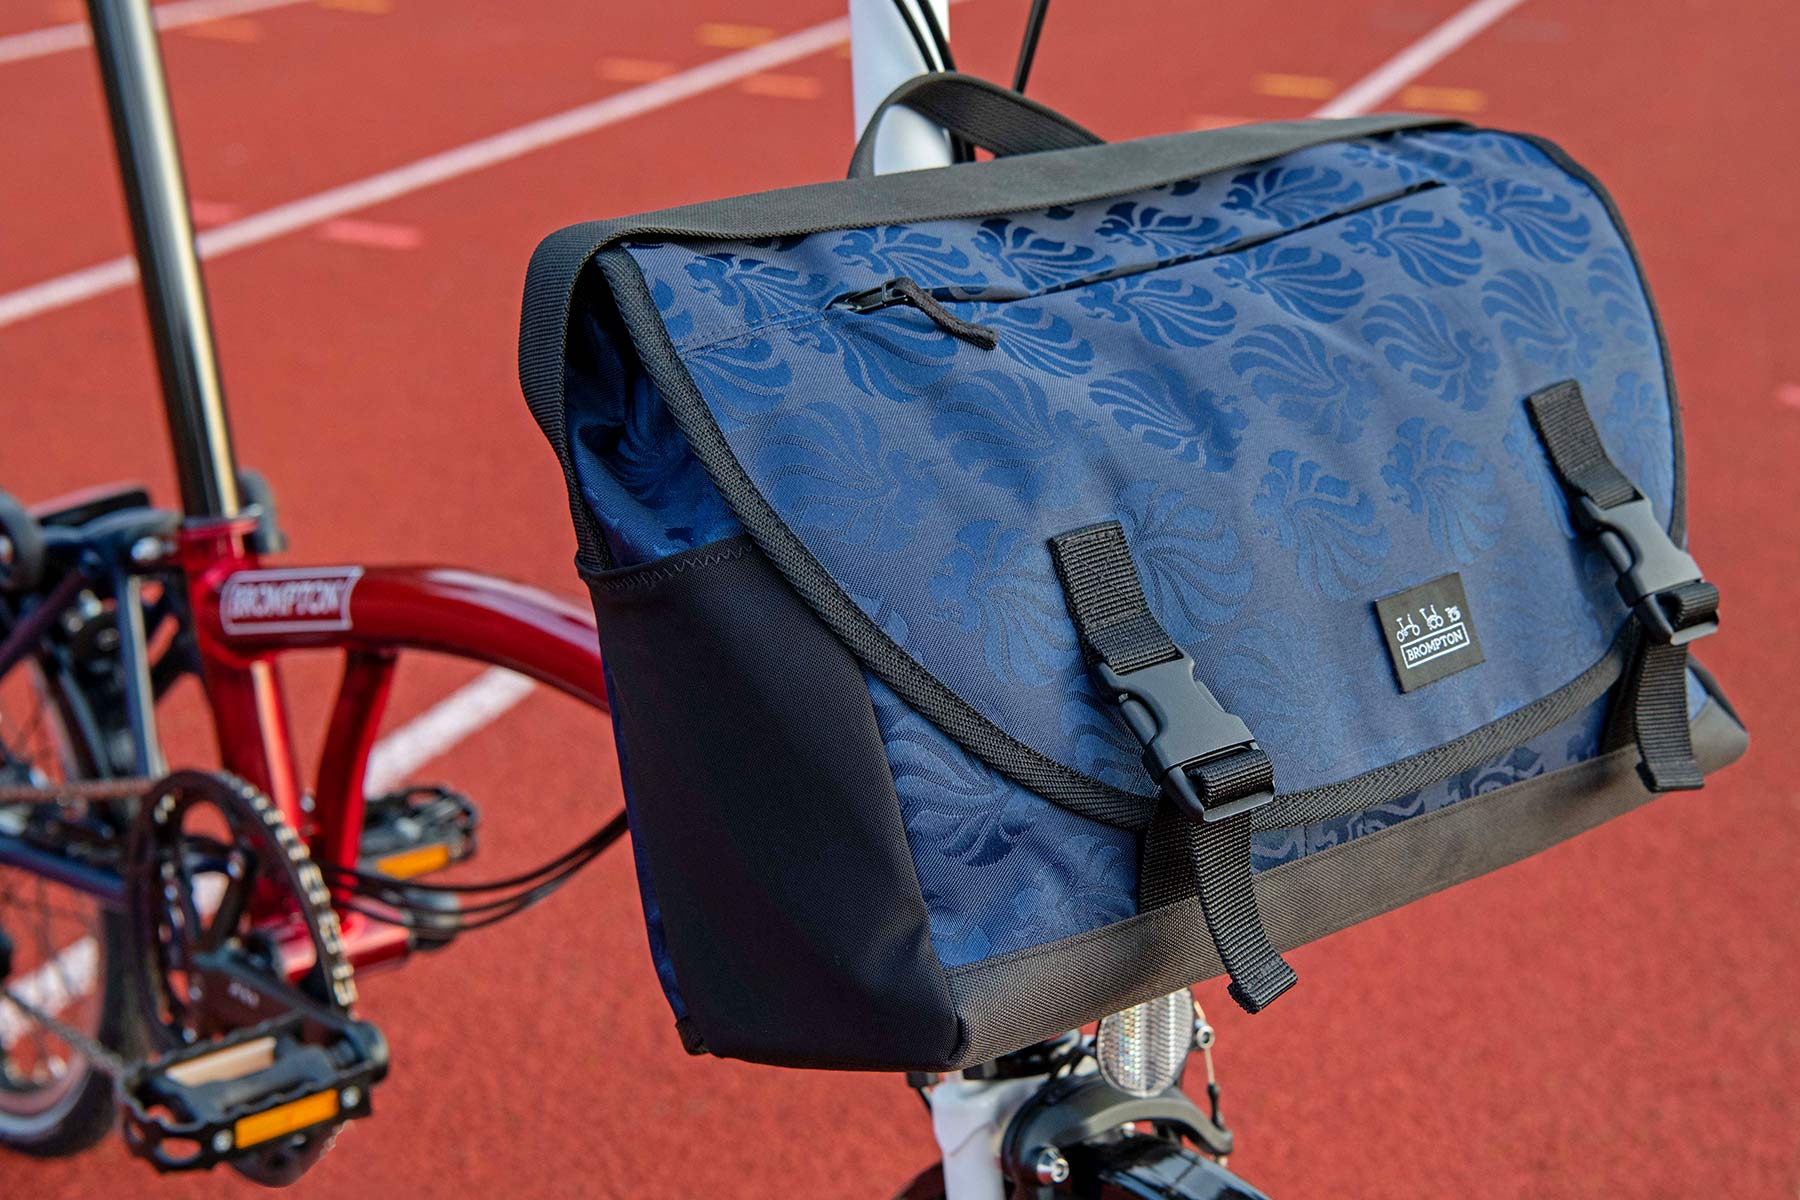 Brompton x Team GB folding bike, Tokyo 2020 Olympic limited edition, messenger bag